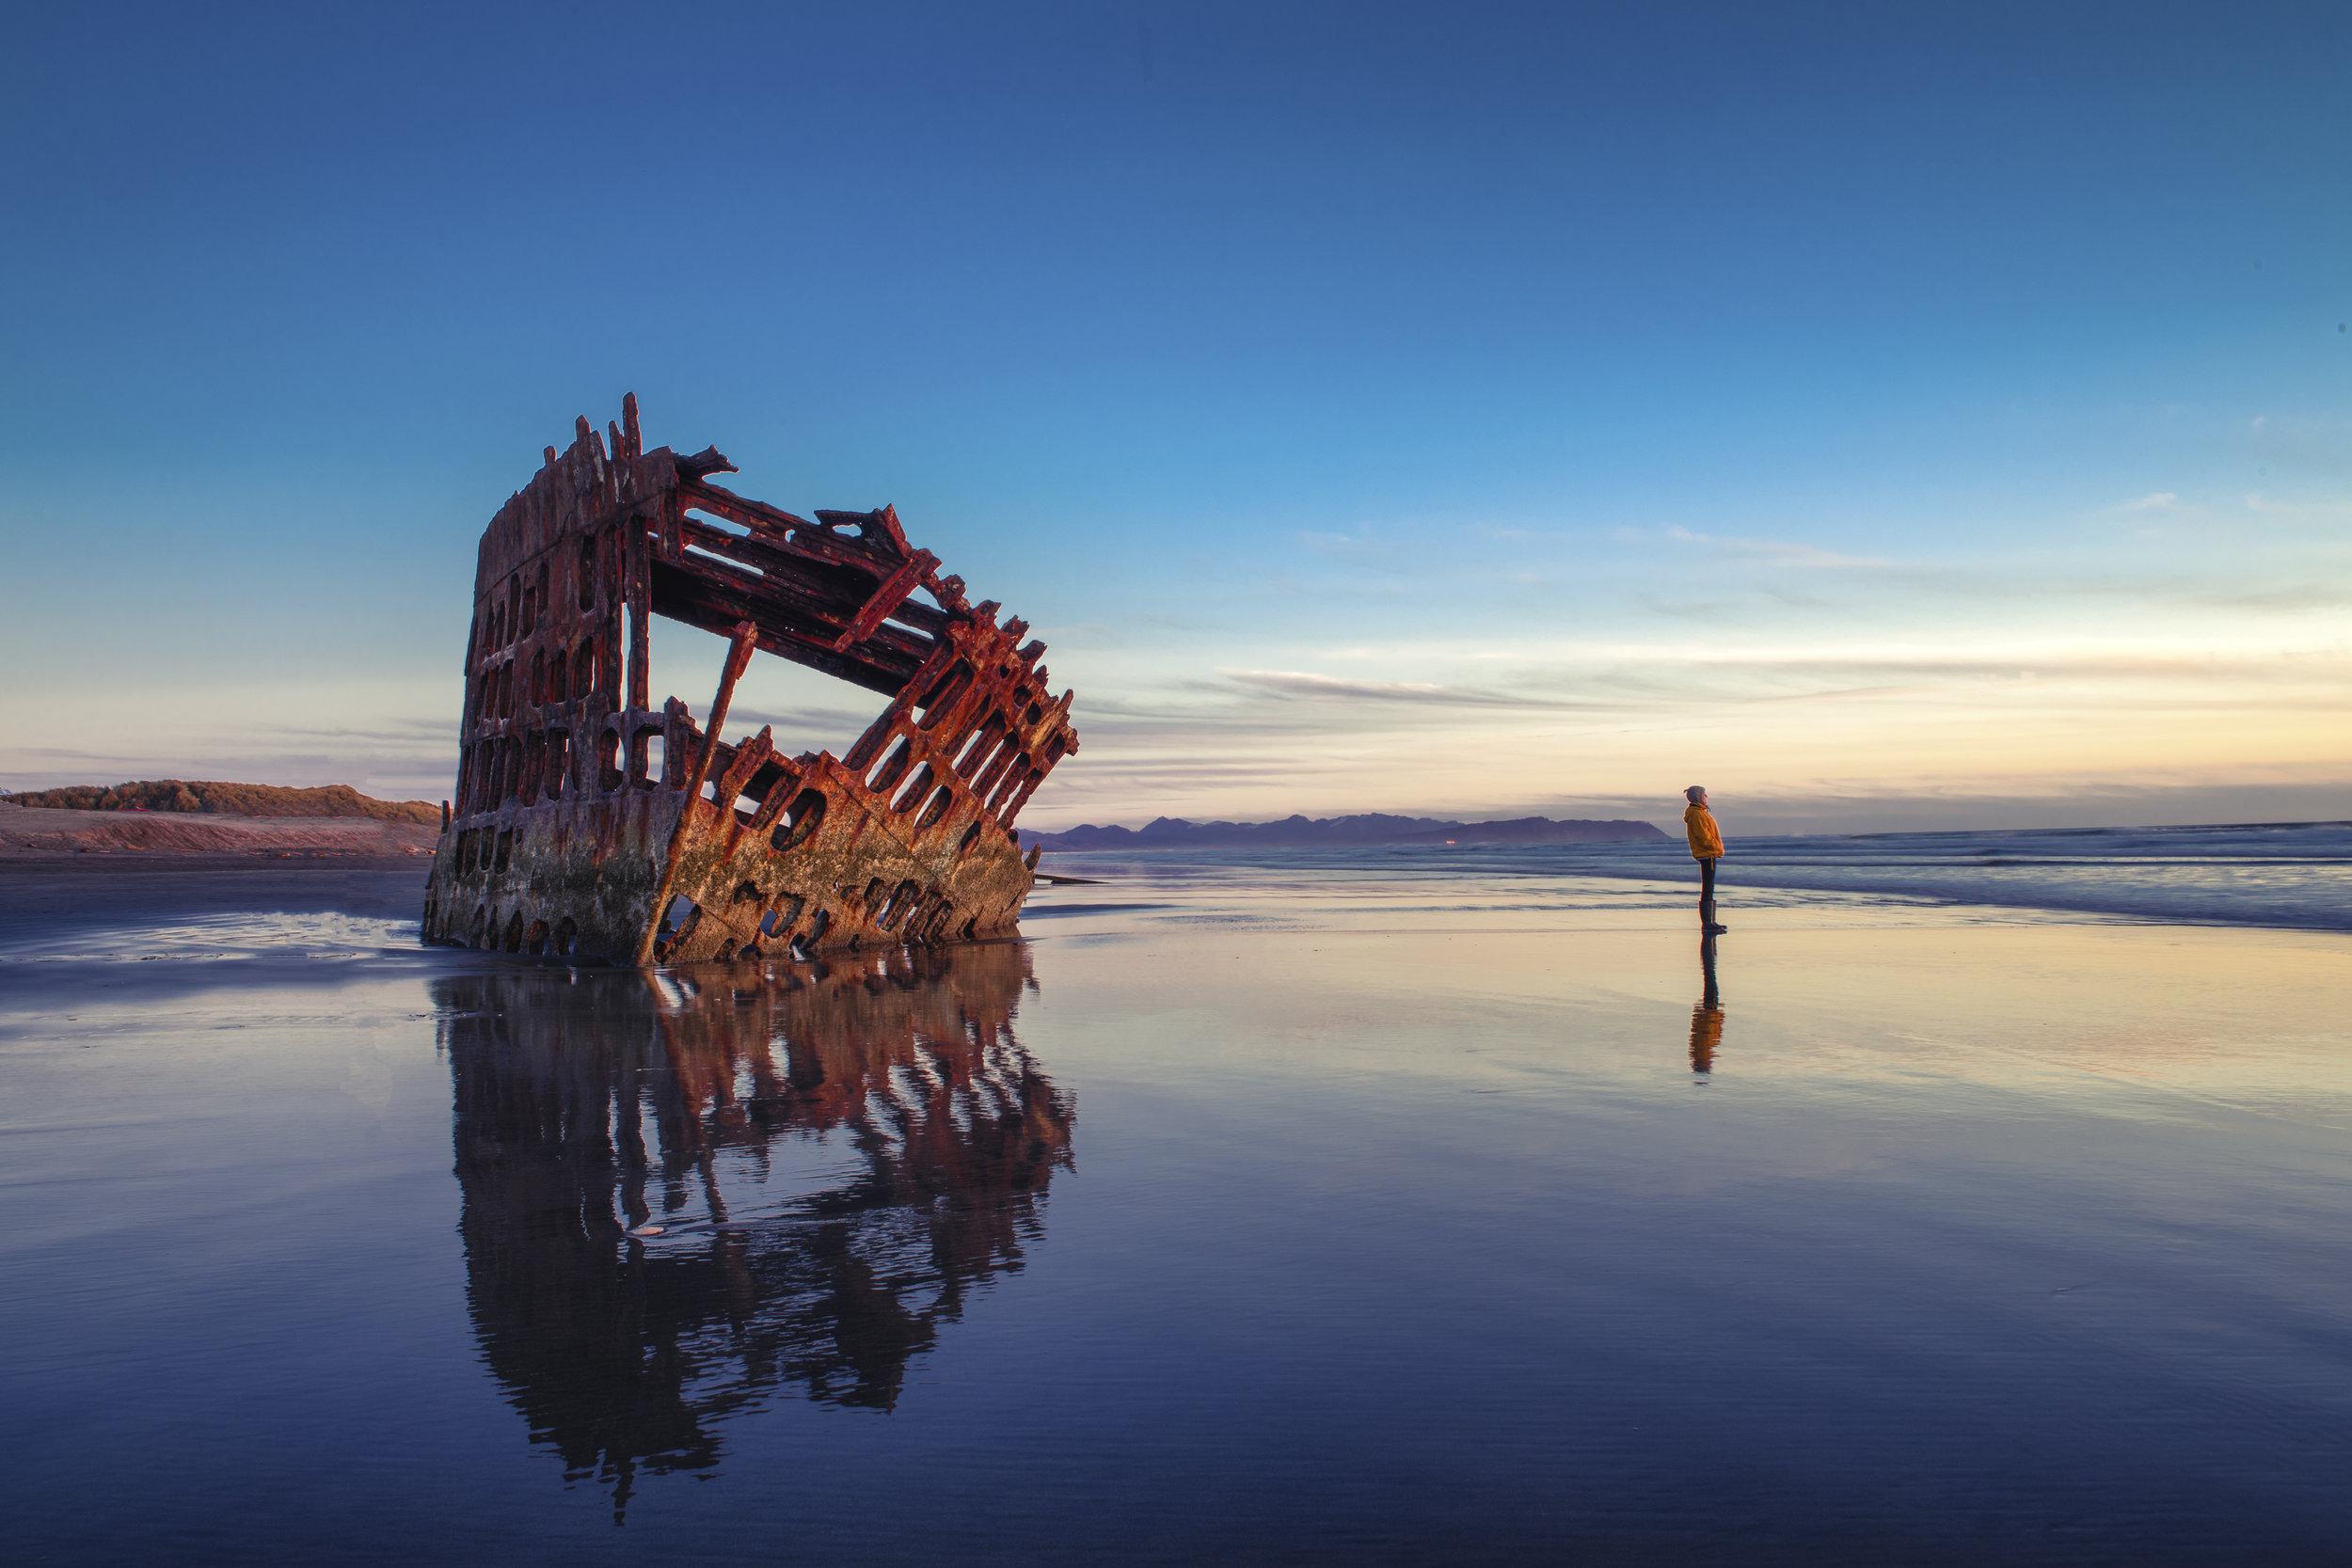 Shipwreck Explorer 1